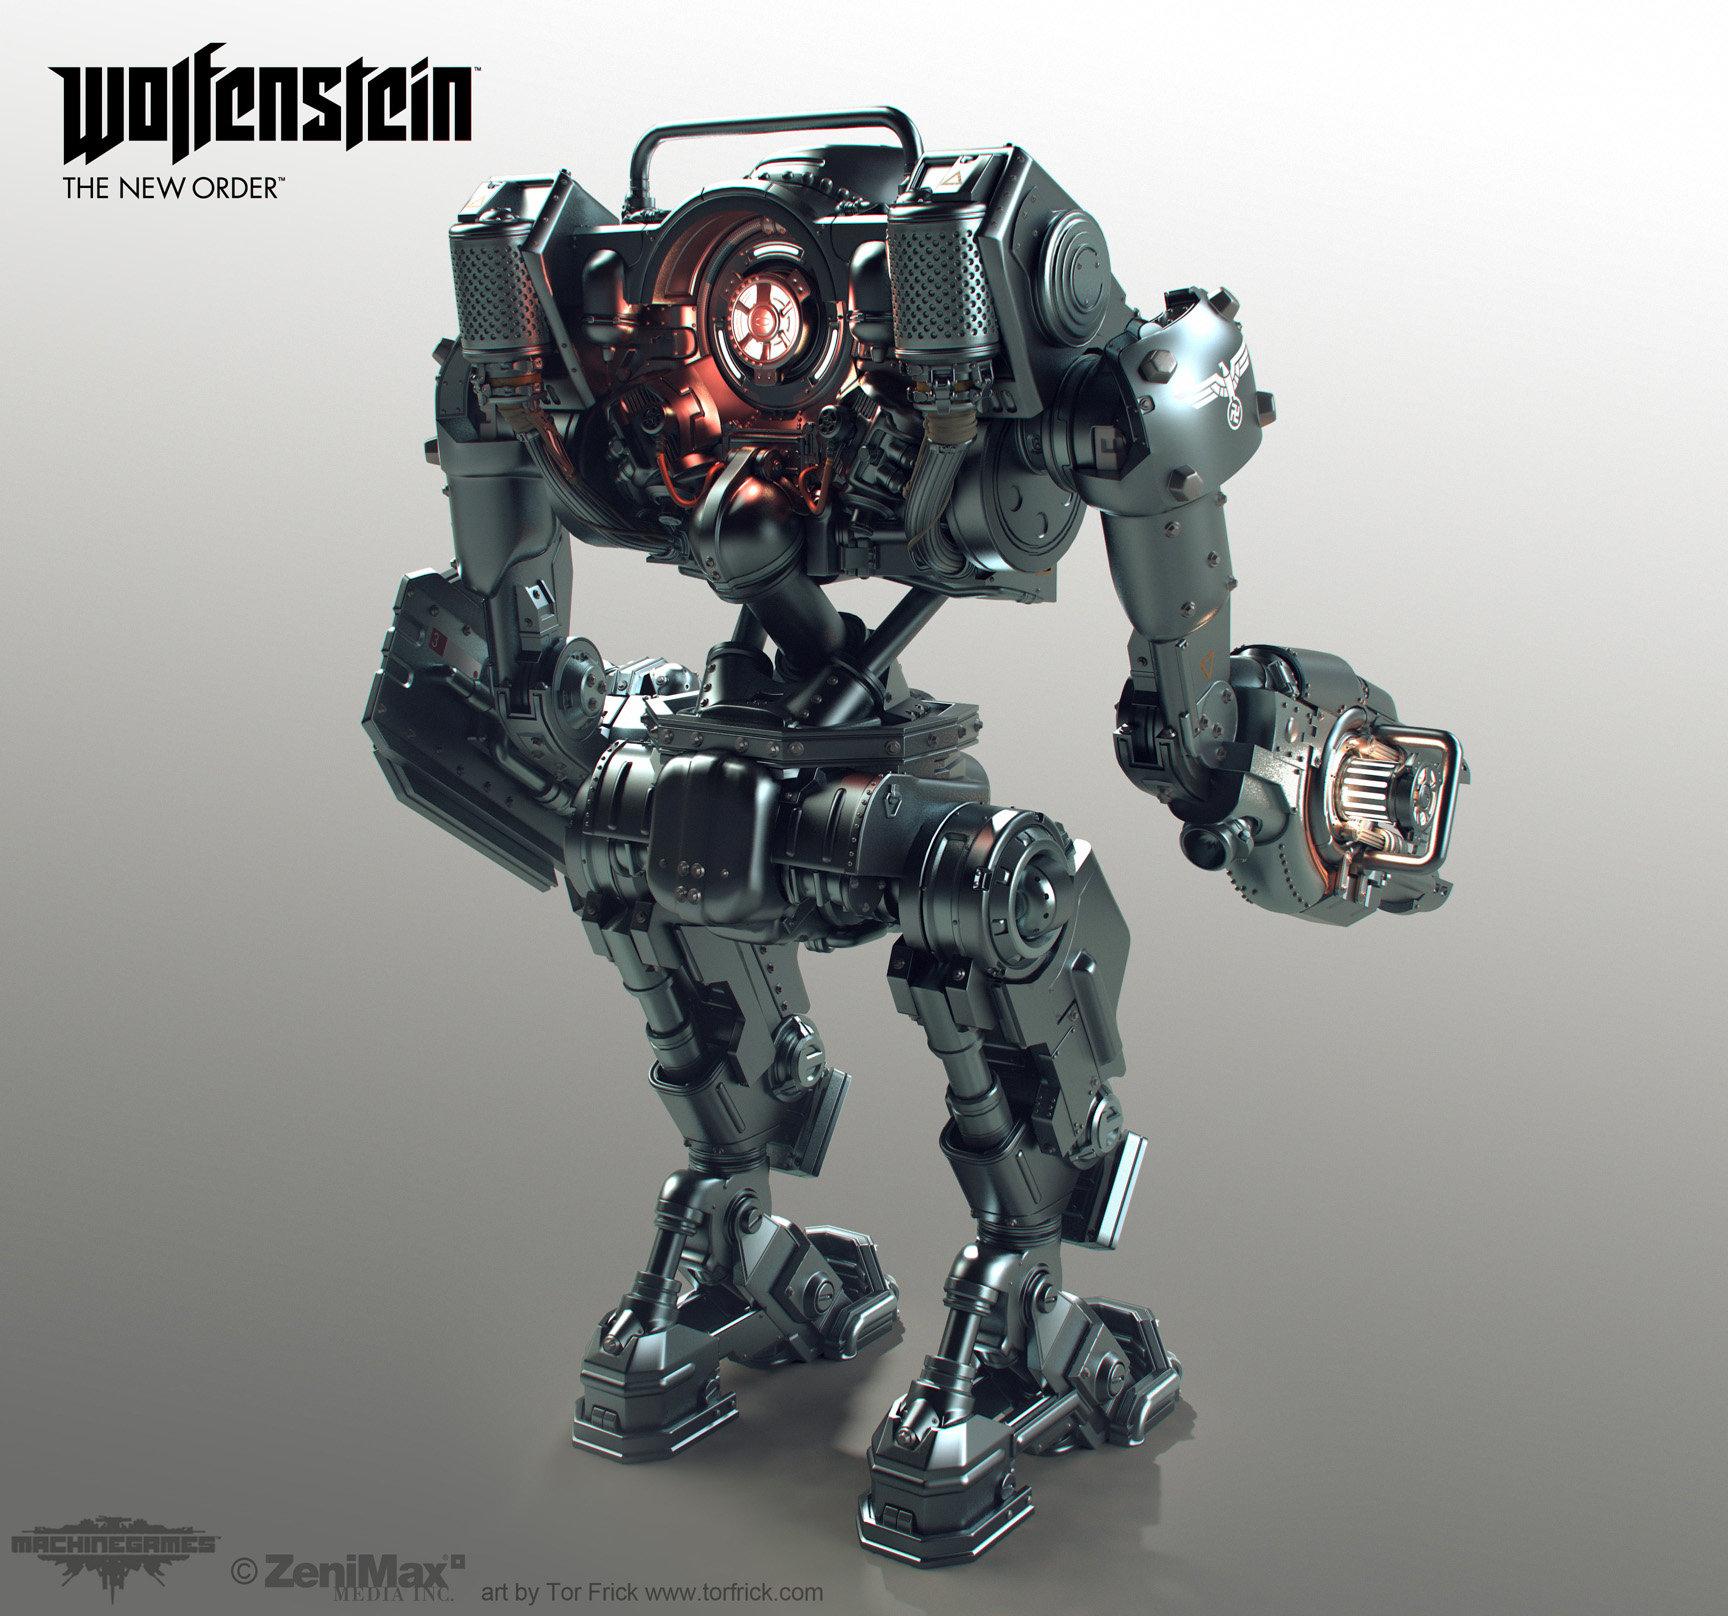 tor-frick-guardrobot1.jpg?1443929519